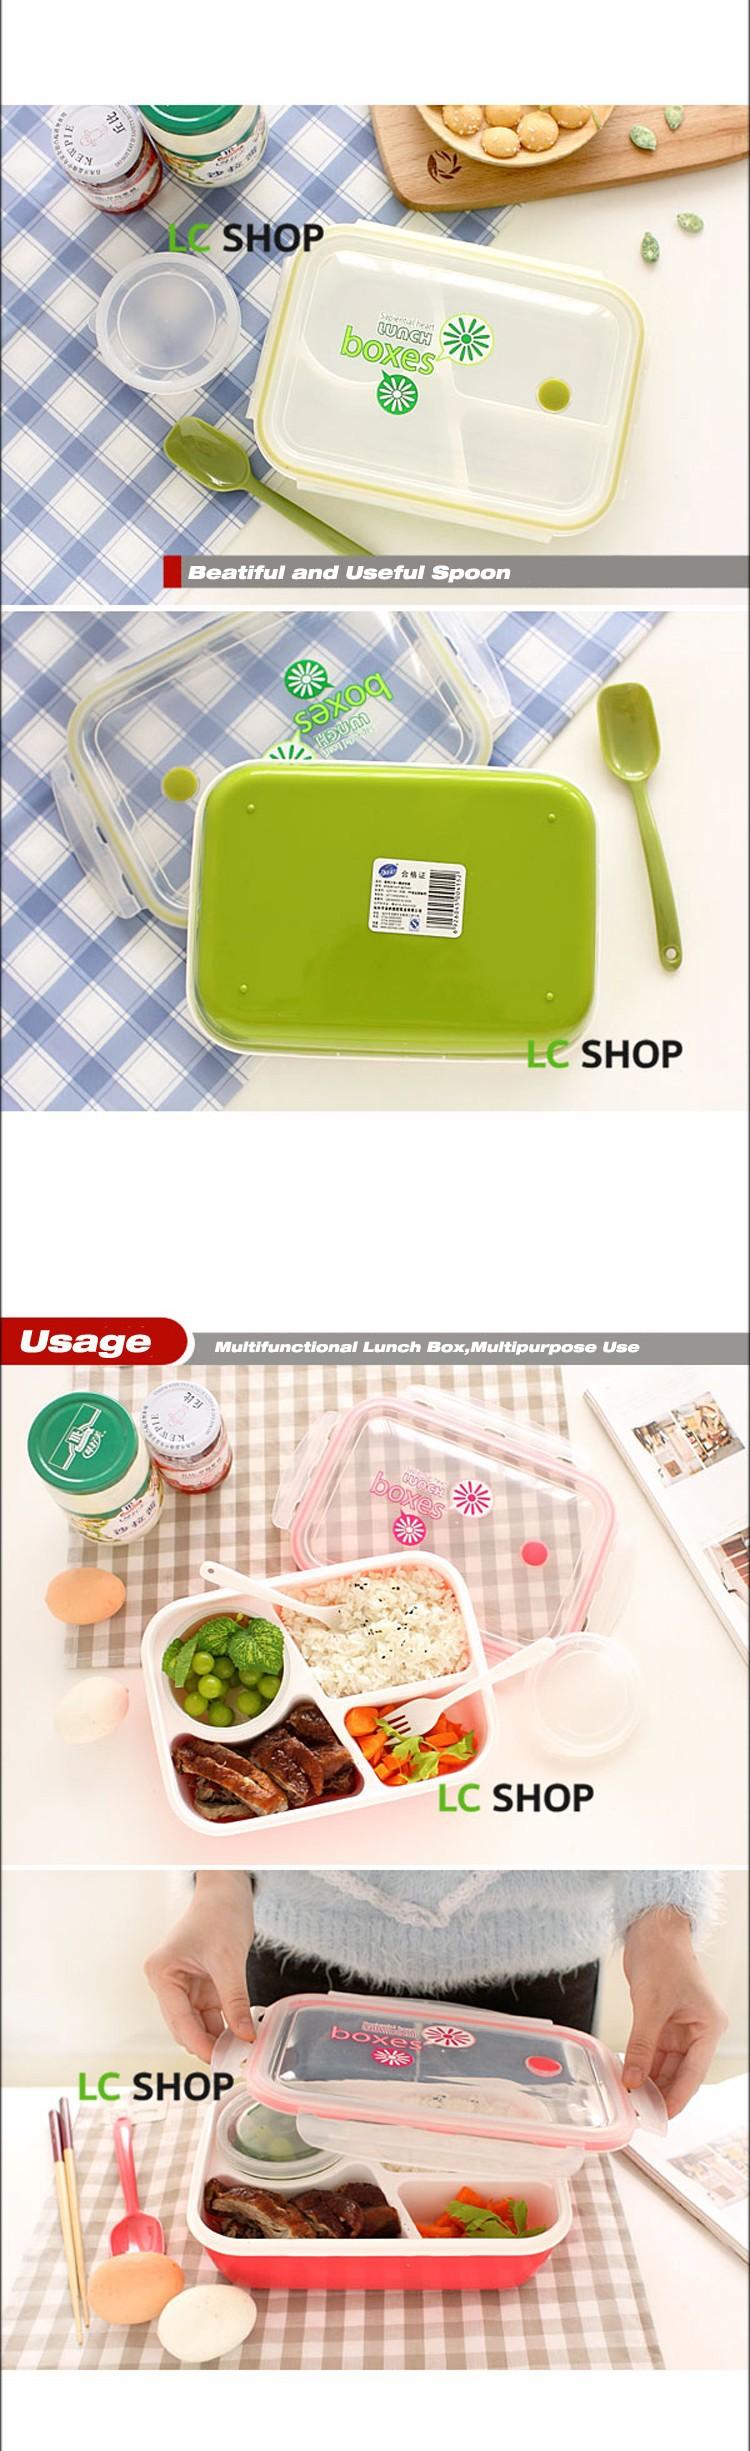 4 Compartment Microwaveable Bento Box